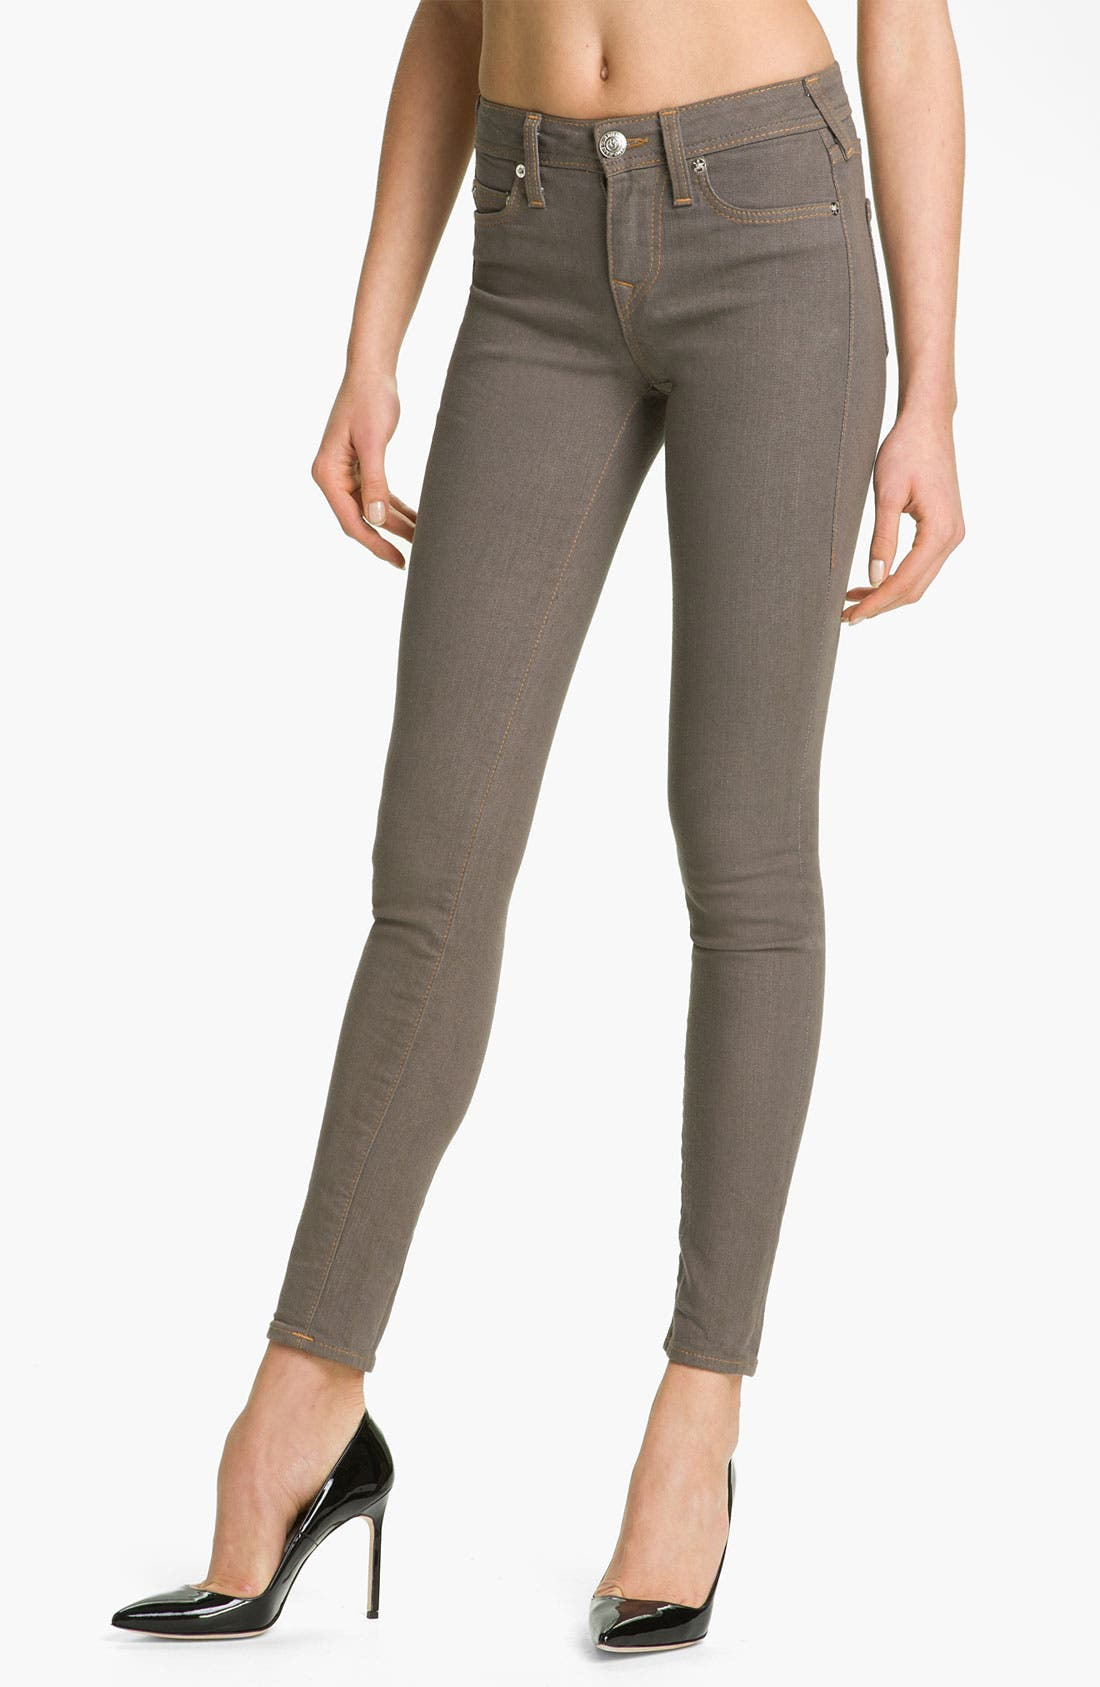 Alternate Image 1 Selected - True Religion Brand Jeans 'Halle' Skinny Stretch Jeans (Dark Storm)